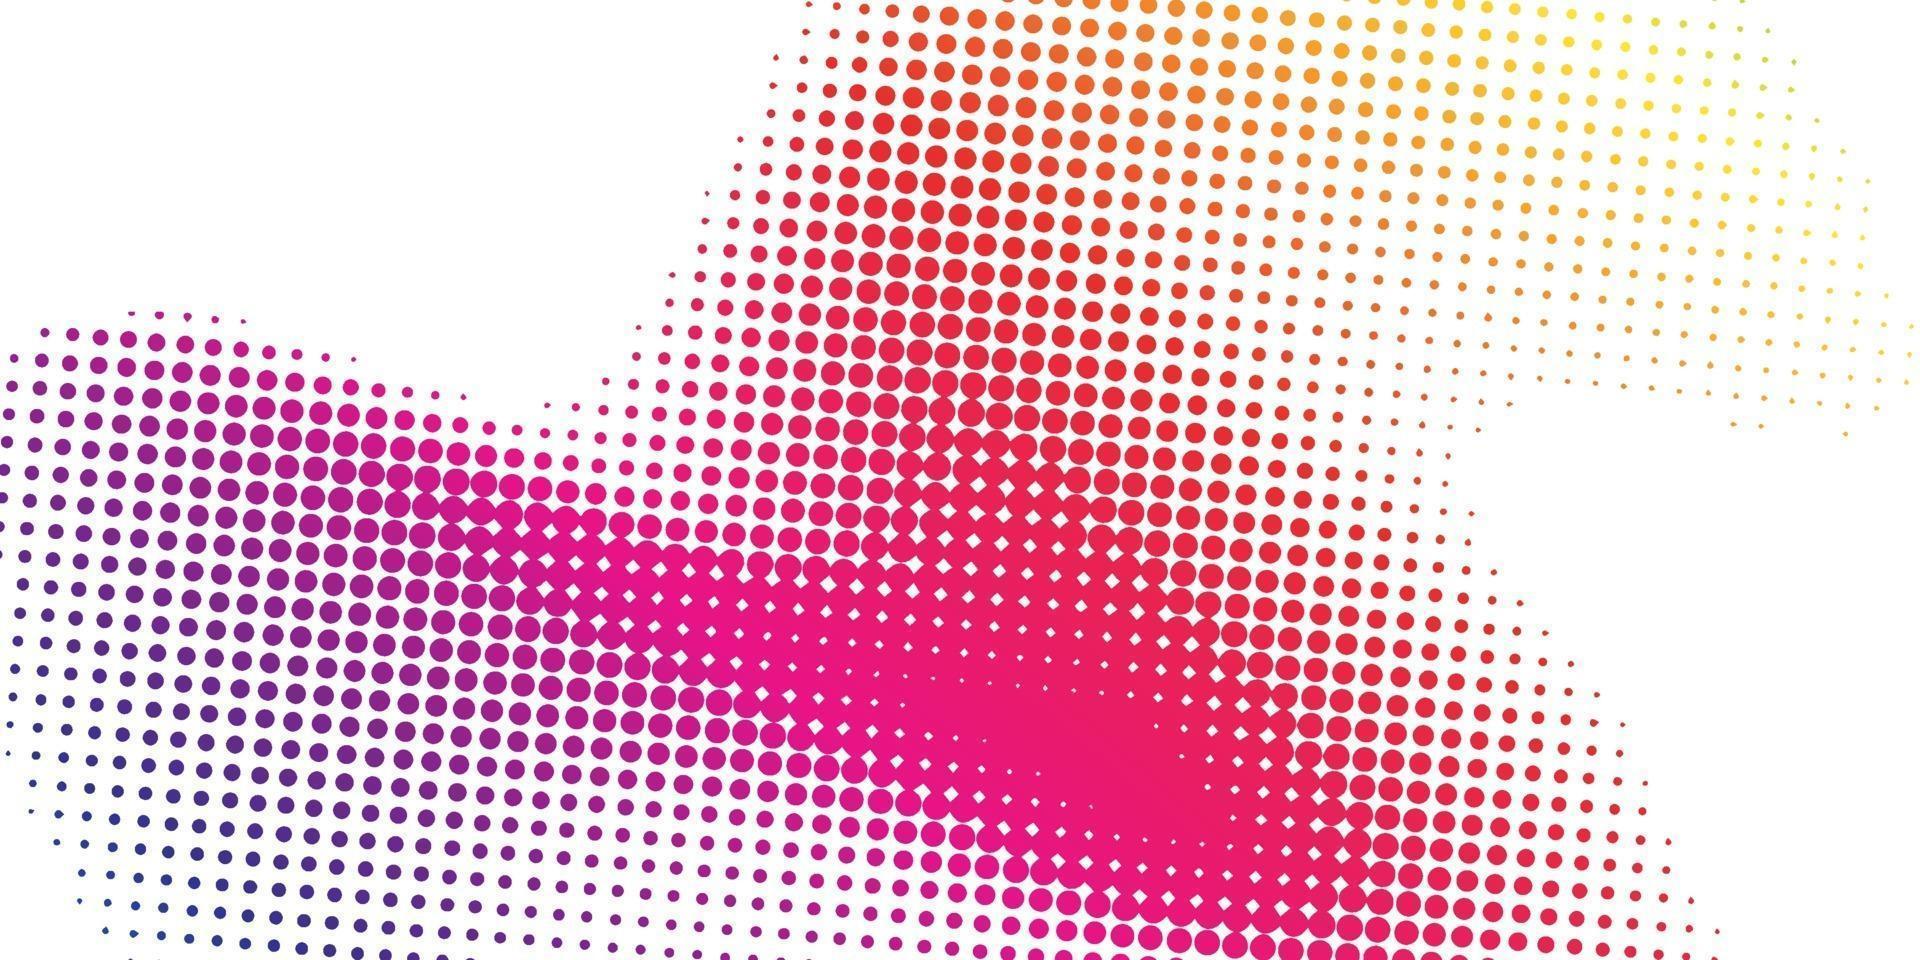 conceito ecológico de fundo gradiente colorido de meio-tom abstrato vetor